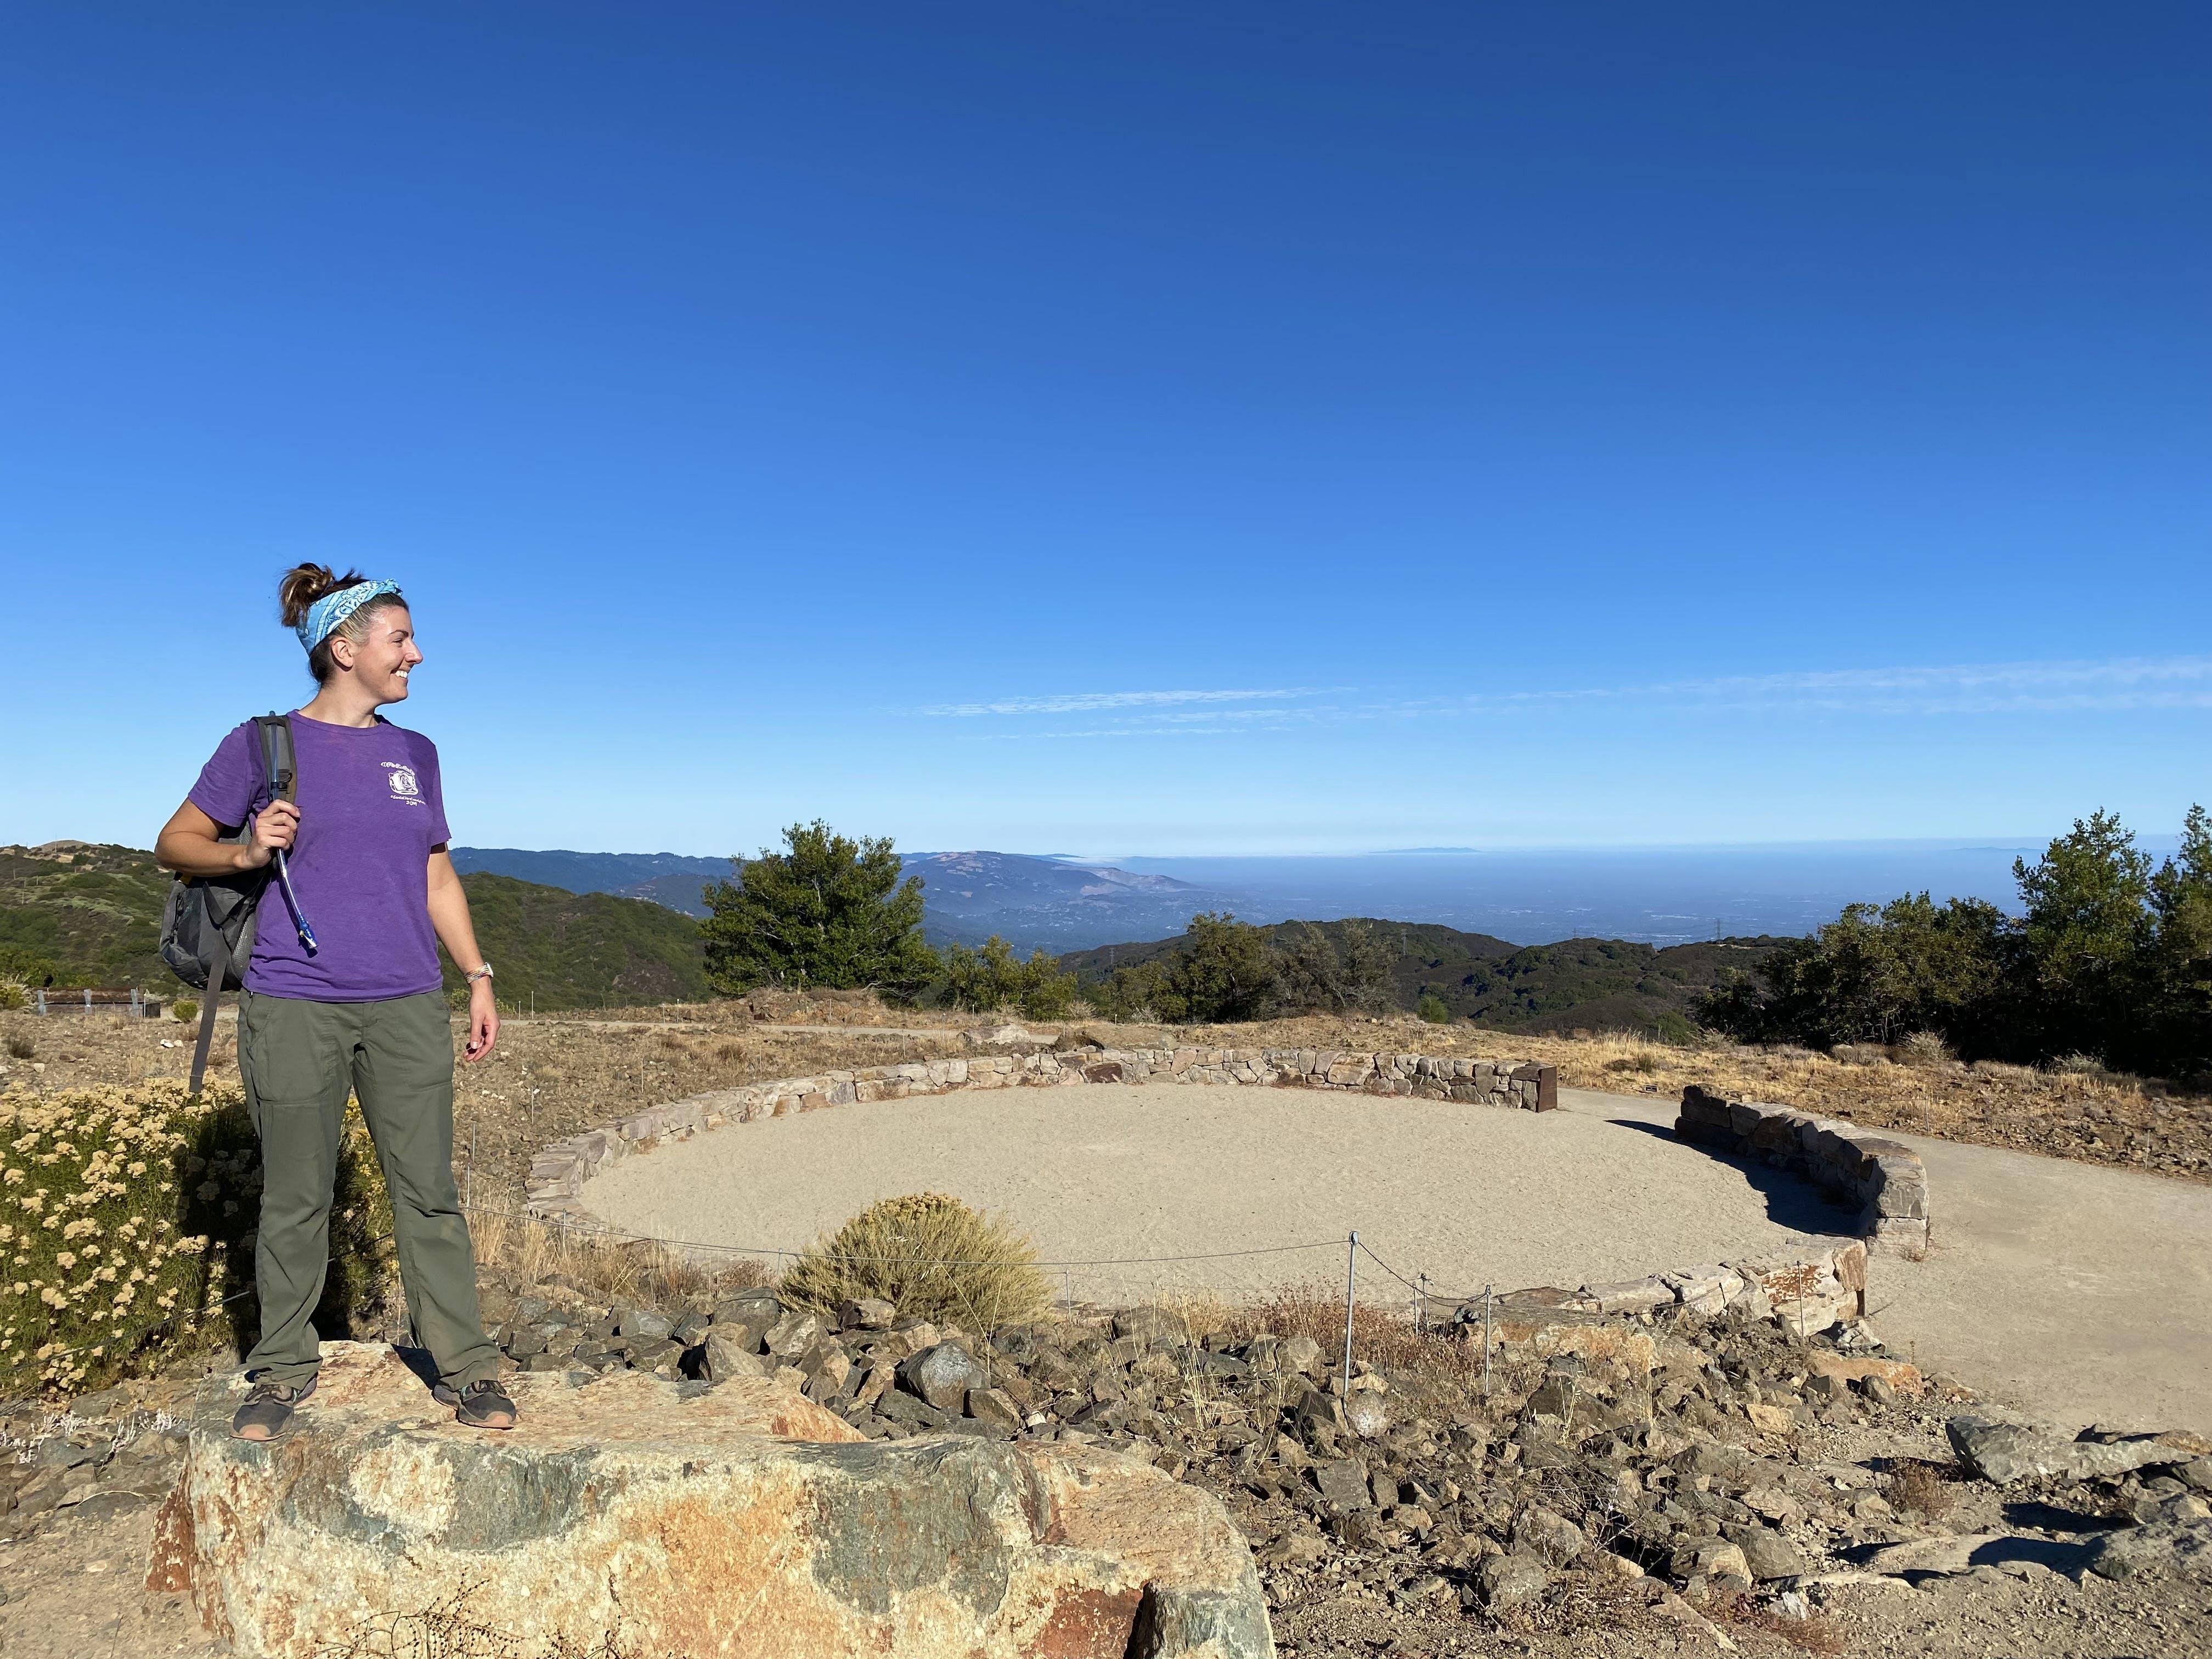 HIker at the Ceremonial Circle at the summit of Mount Umunhum in the Santa Cruz Mountains South Bay